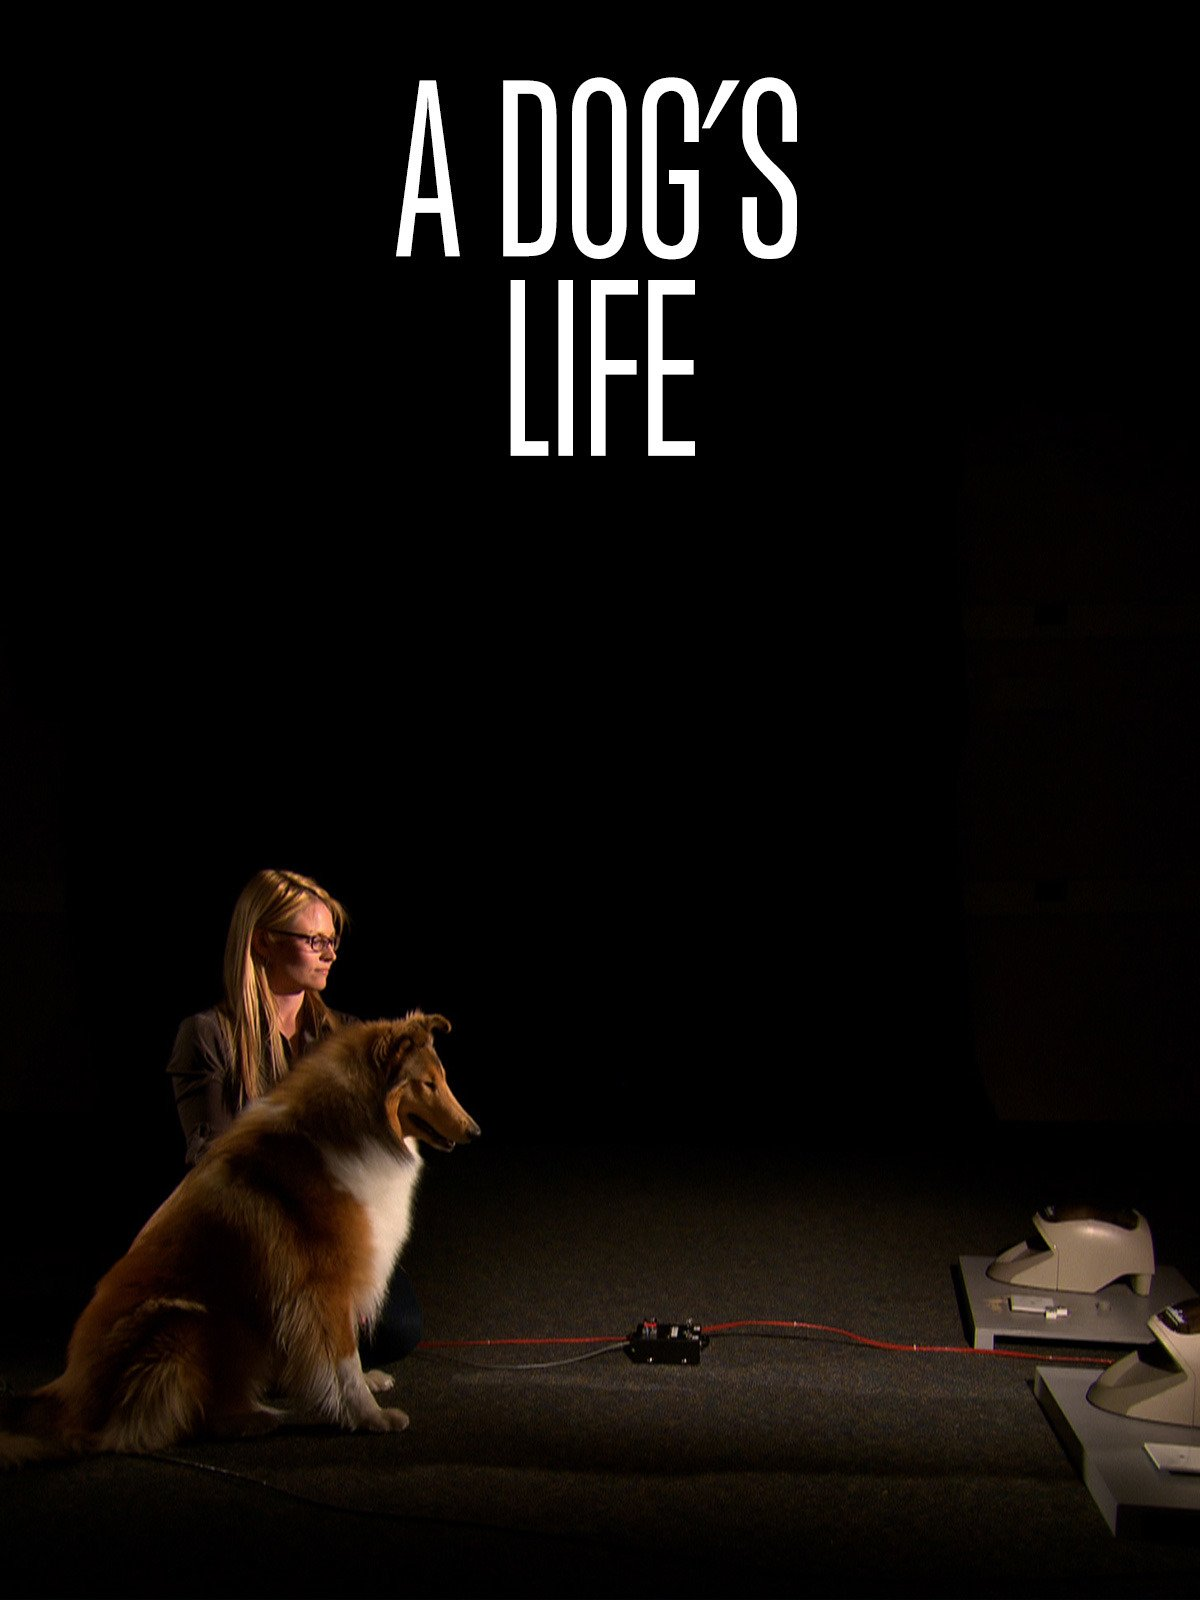 Dogs Life Daniel Zuckerbrot